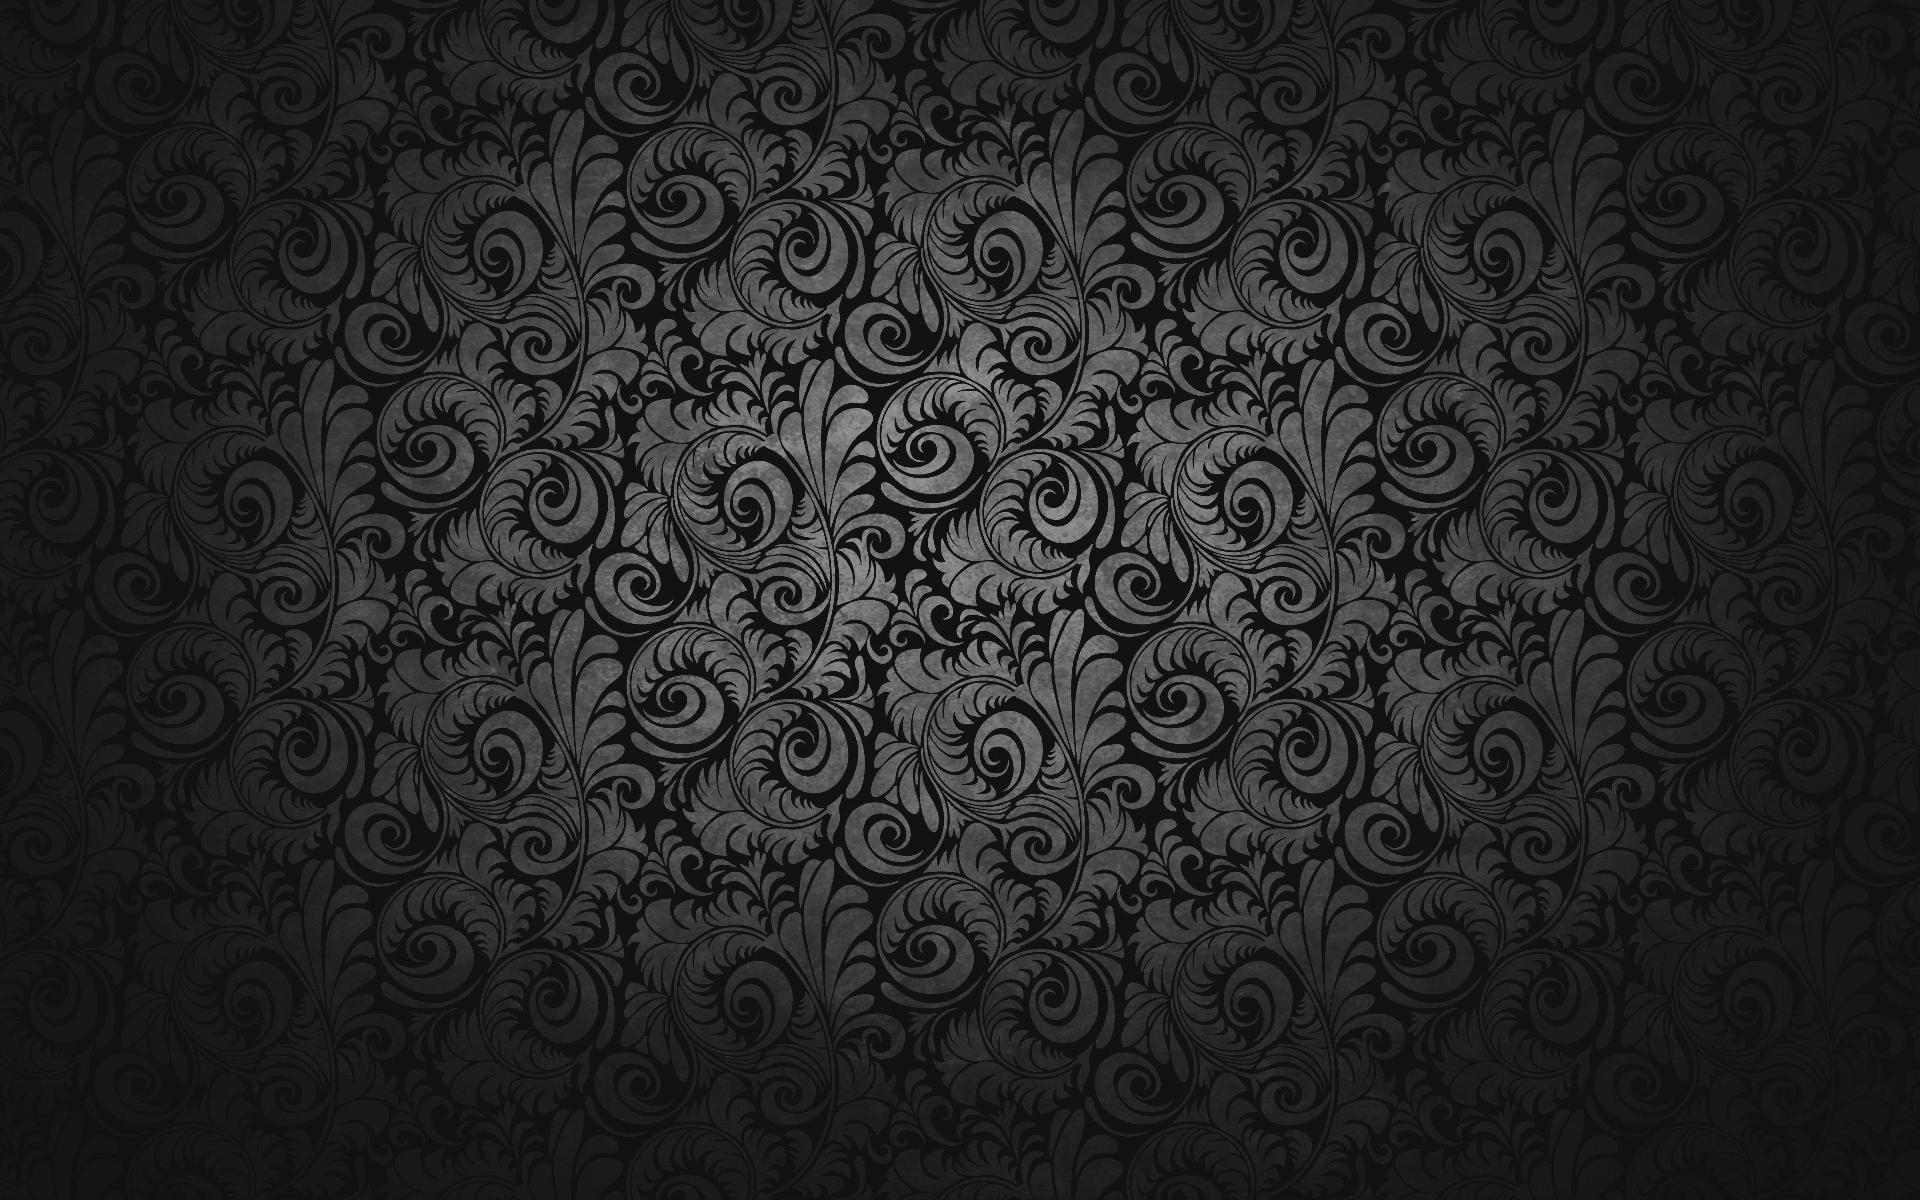 Black And Silver Wallpaper 32 Wallpaper Wallpaper 1920x1200